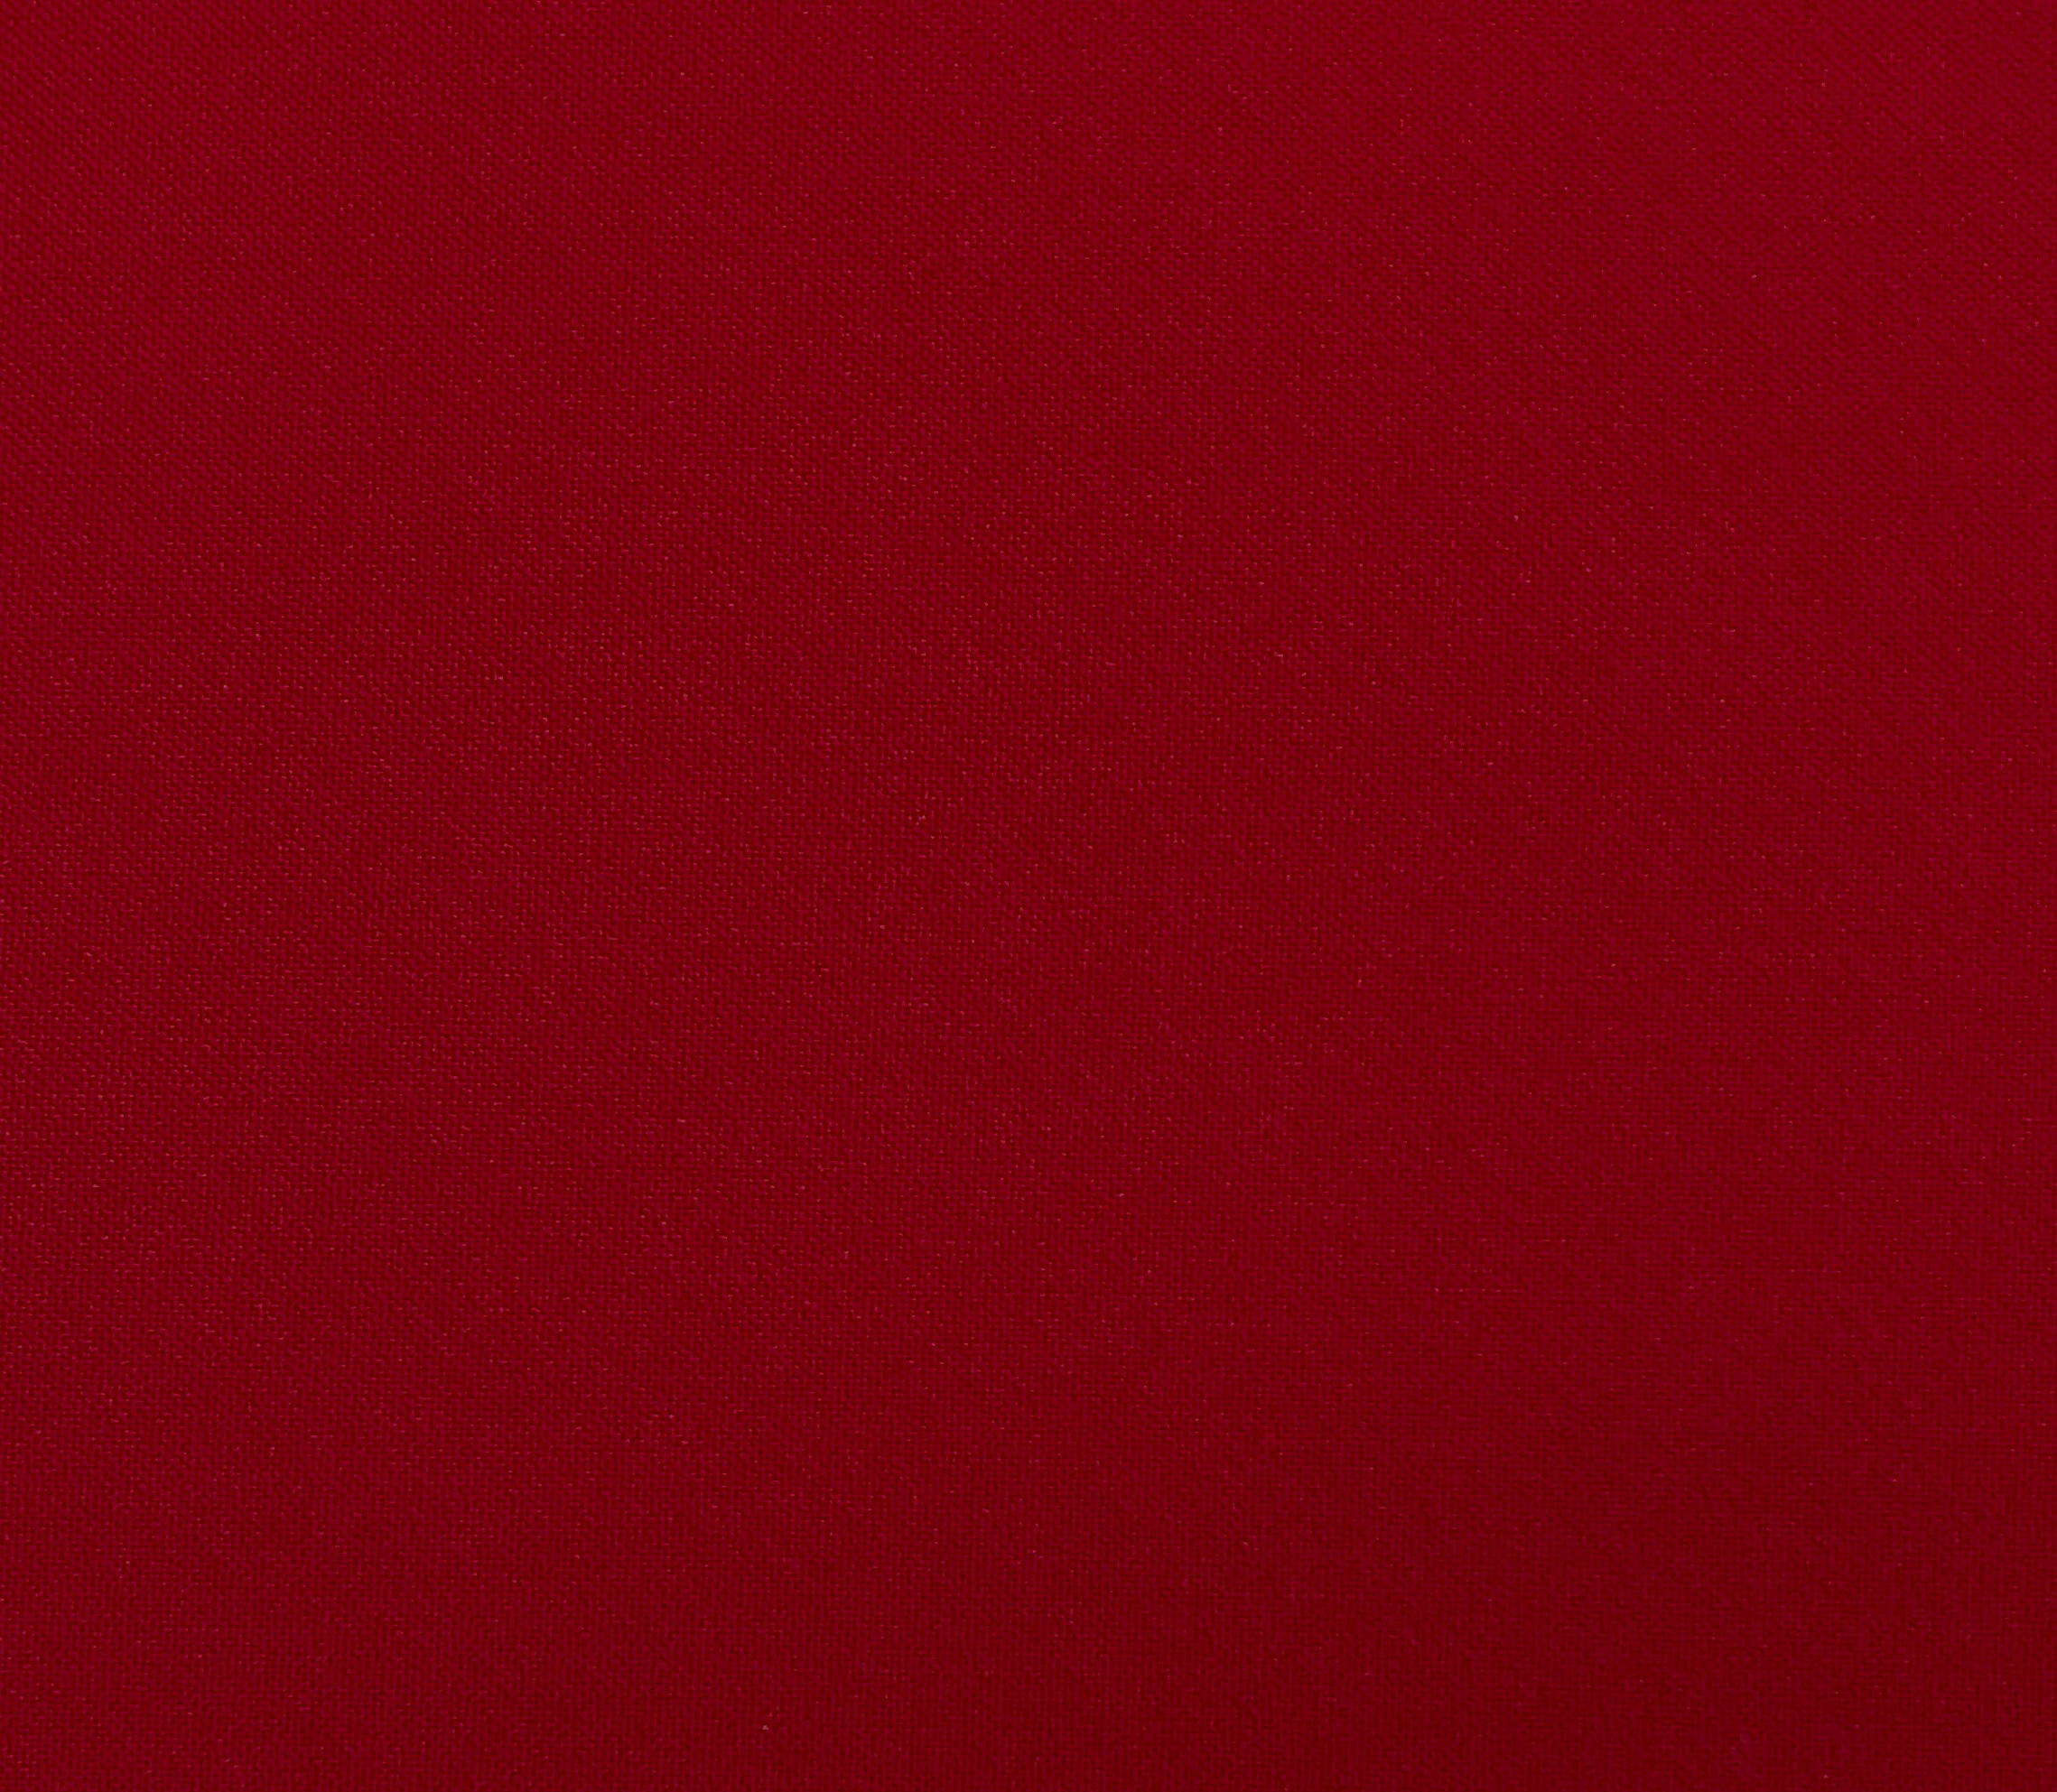 Coupon de tissu cr pe de polyester couleur groseille 3m x 1 50m i sacr s coupons - Teindre tissu polyester ...